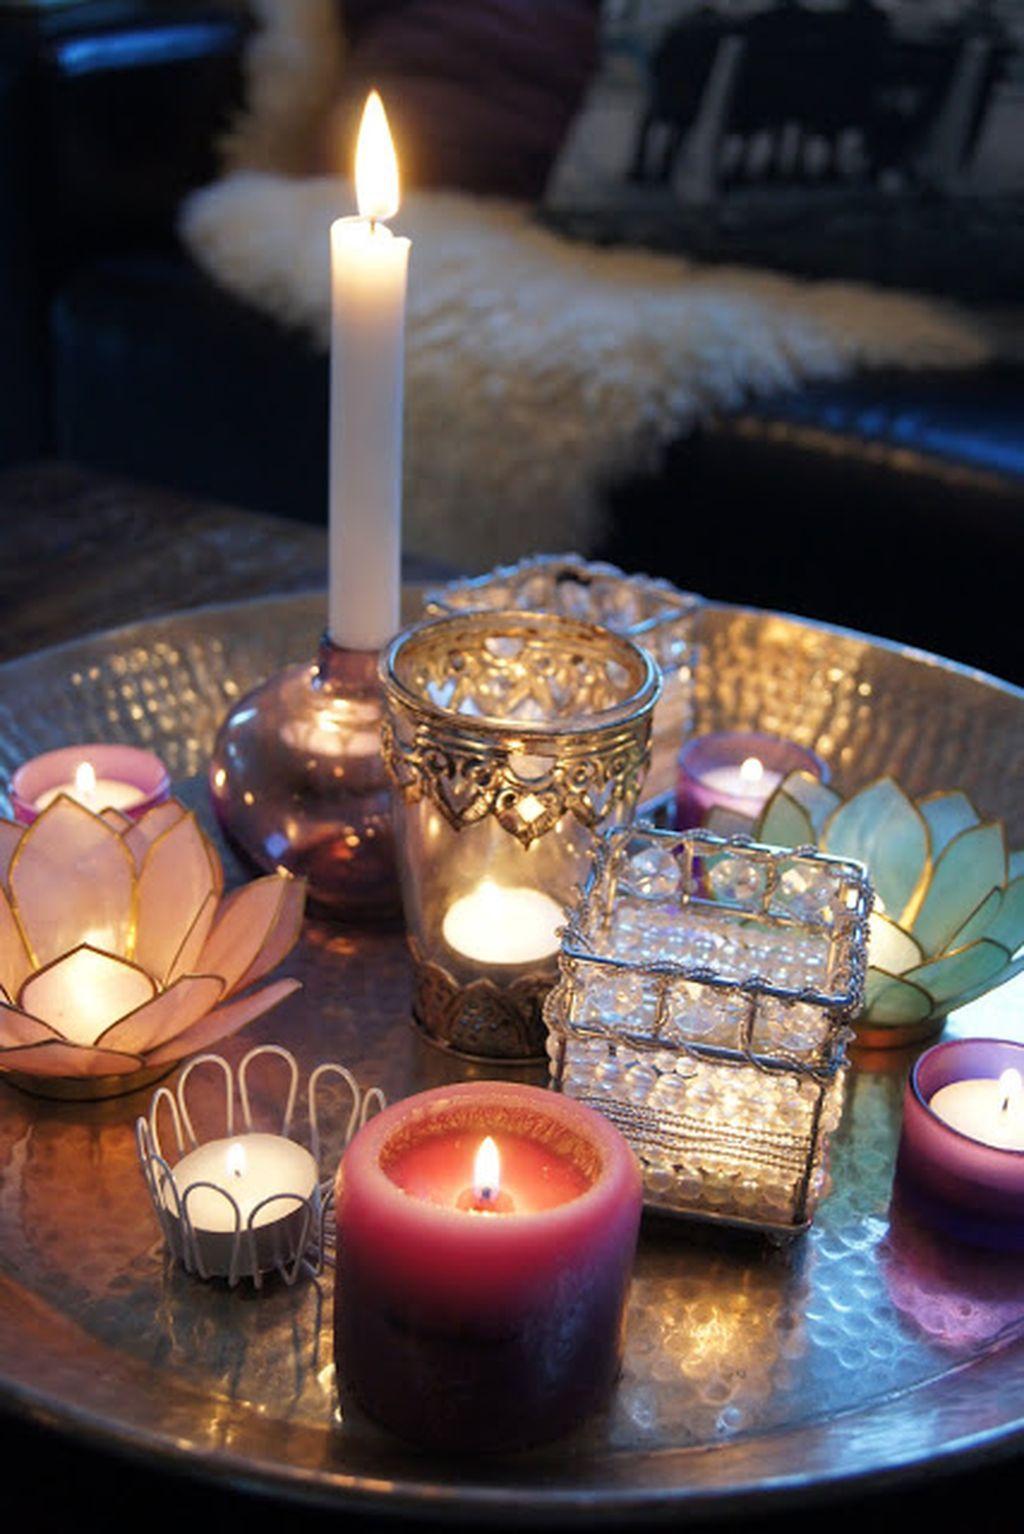 96+ Comfy Boho Chic Style Bedroom Design Ideas | Easy home ...